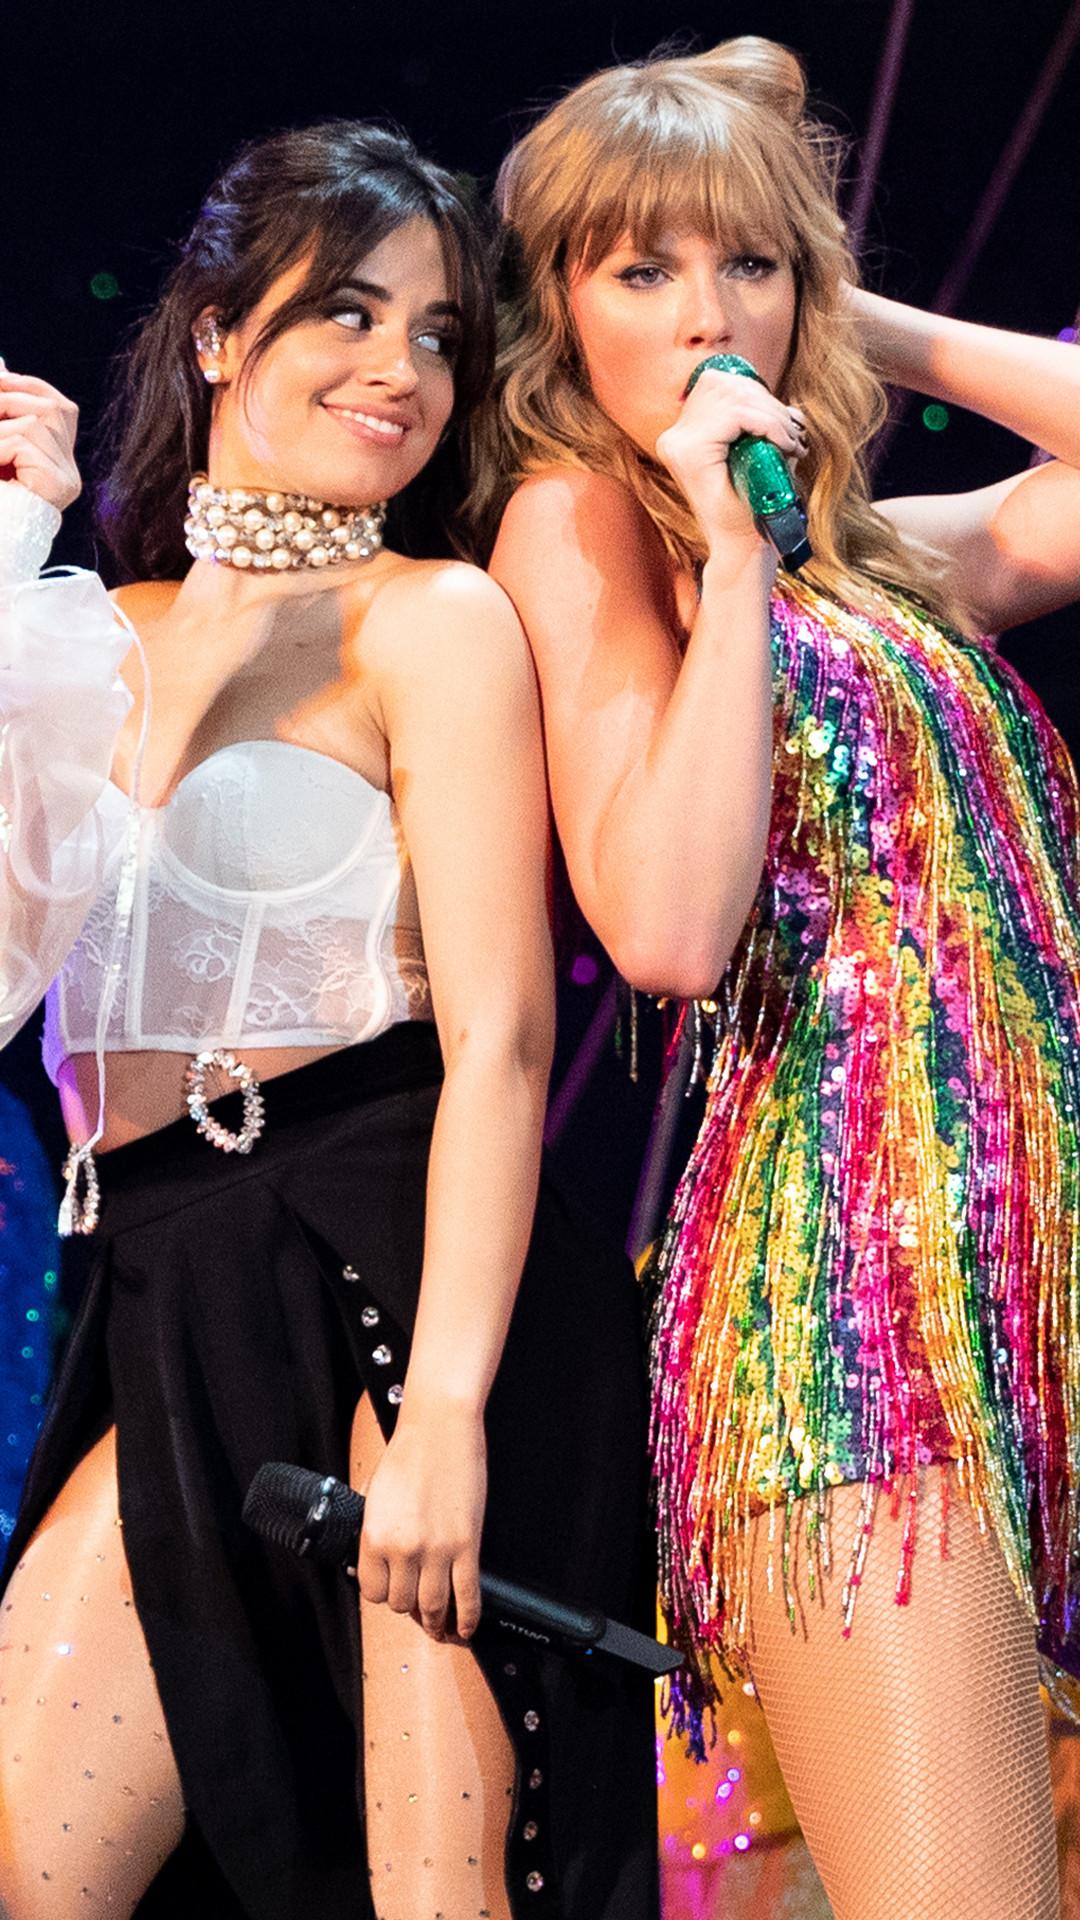 Taylor Swift, Charli XCX, Camila Cabello, Reputation Tour